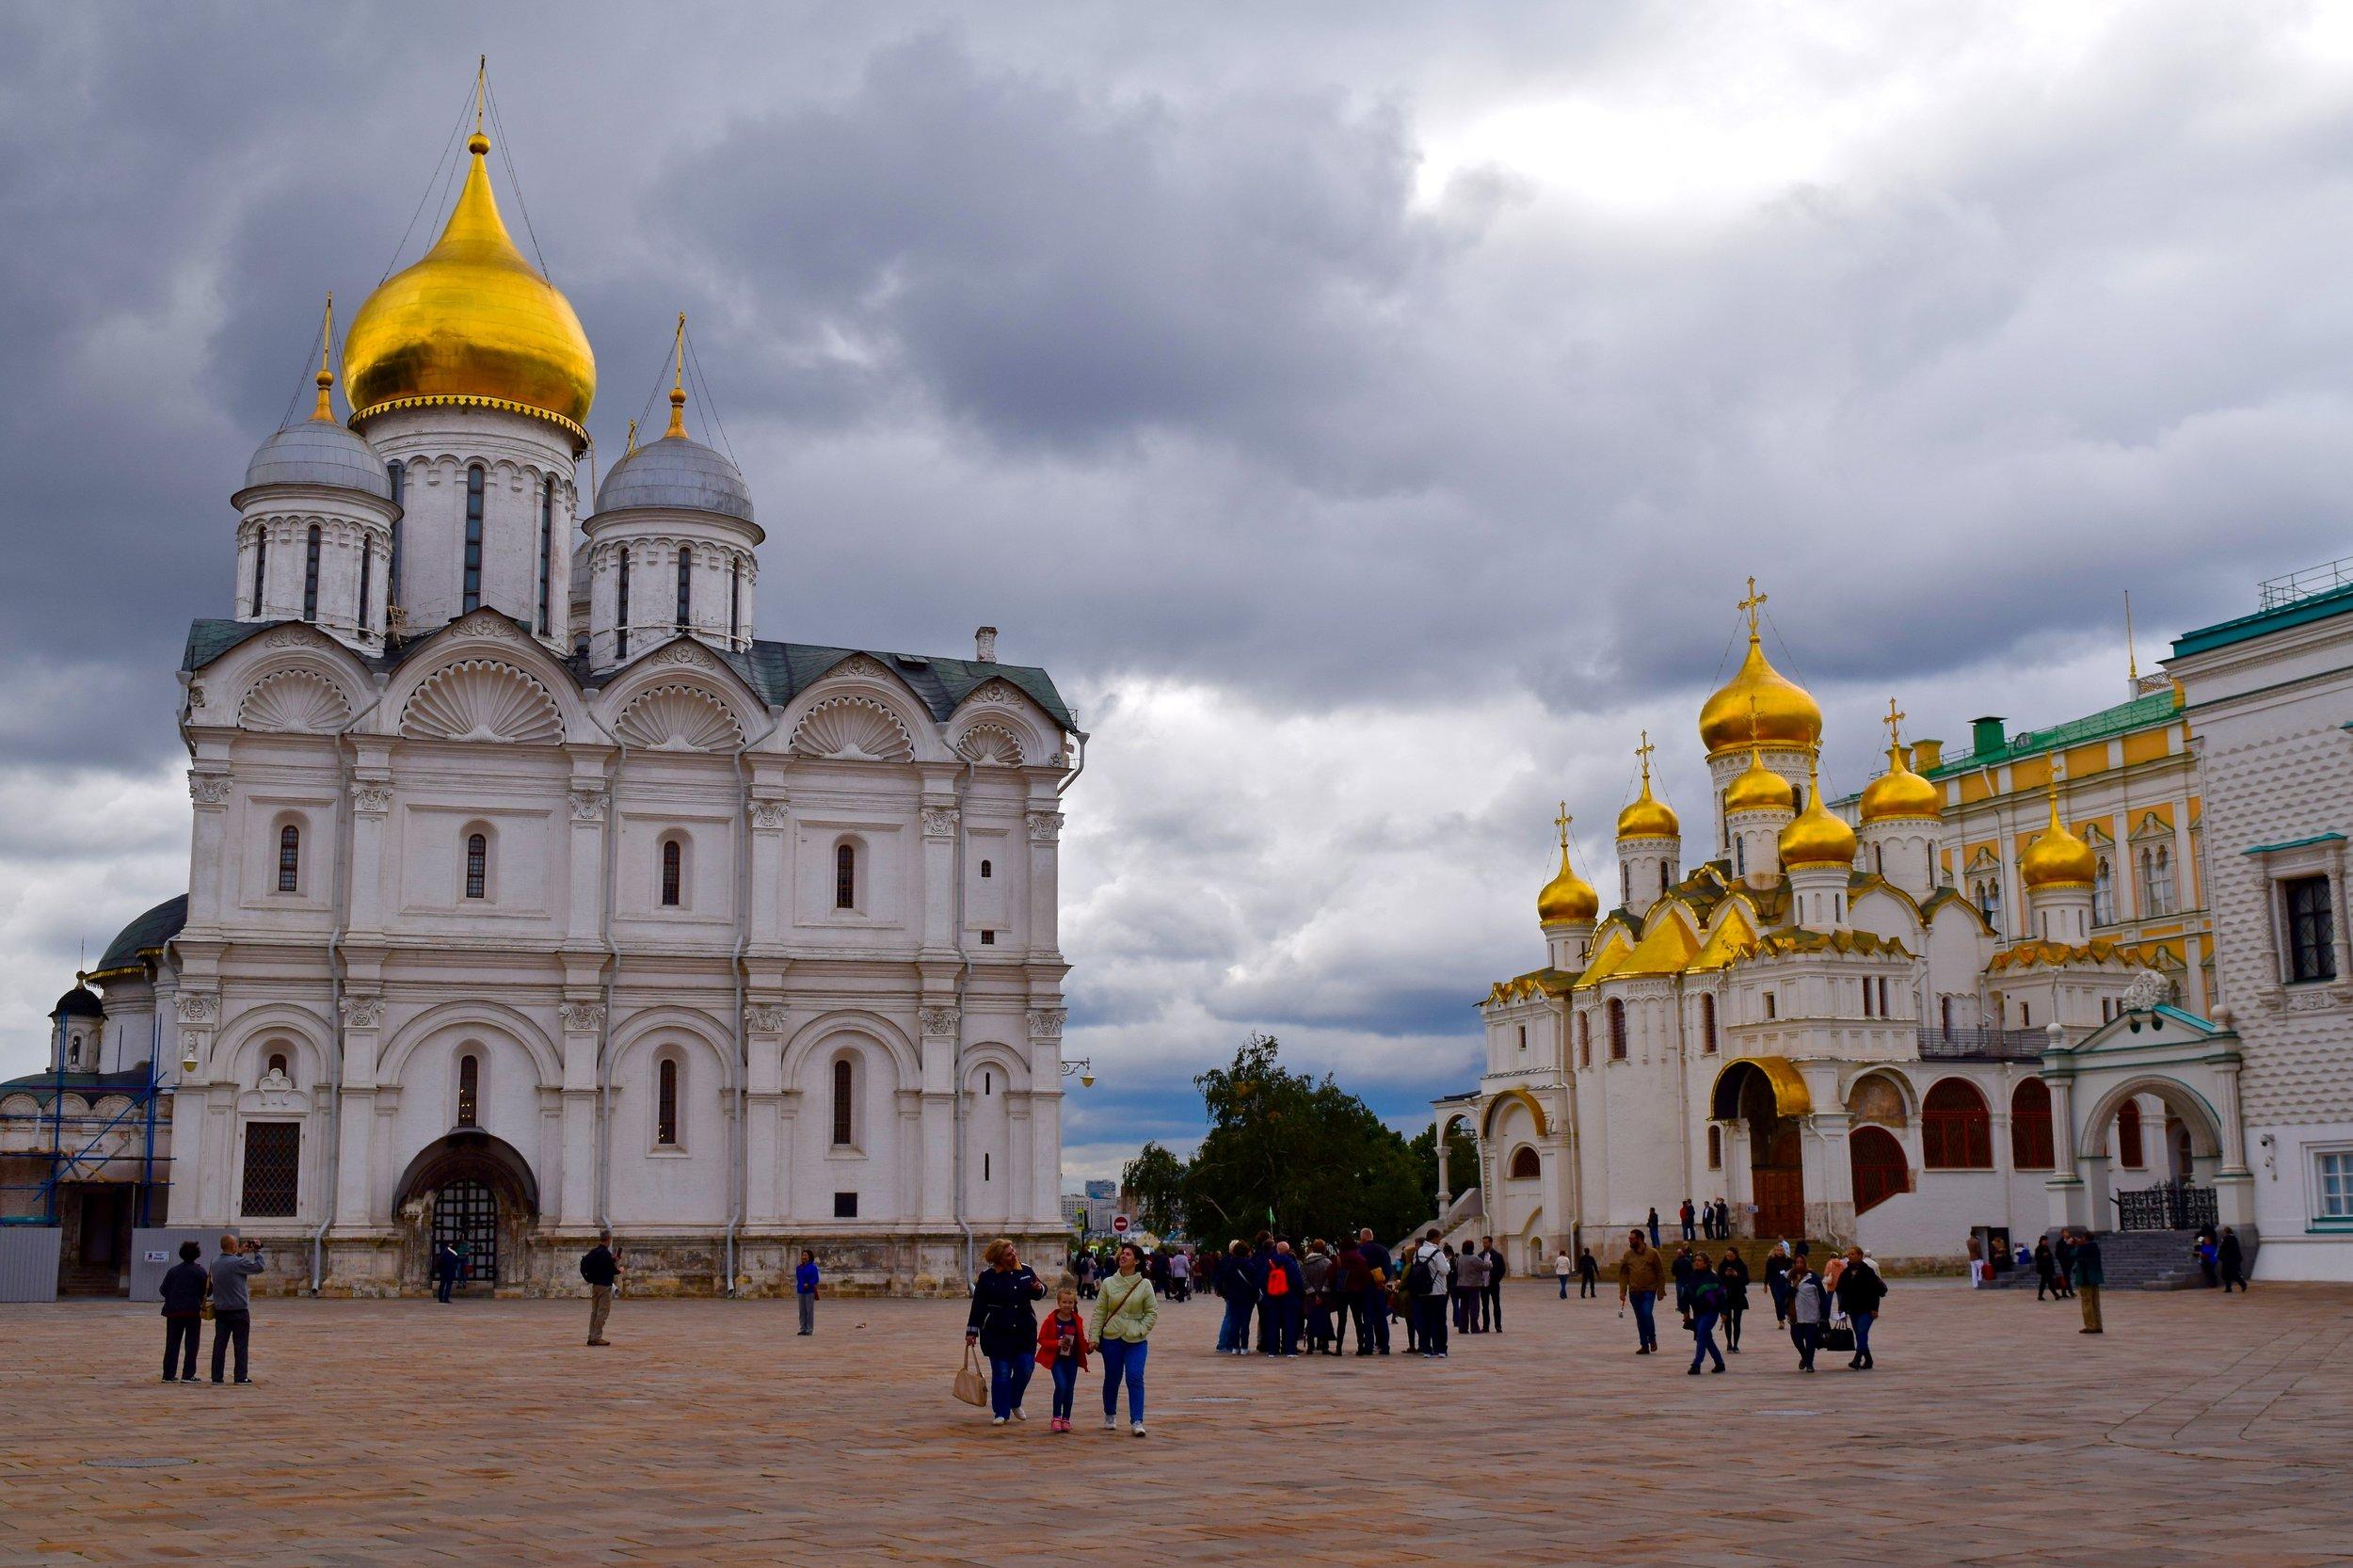 Cathedral Square, Kremlin